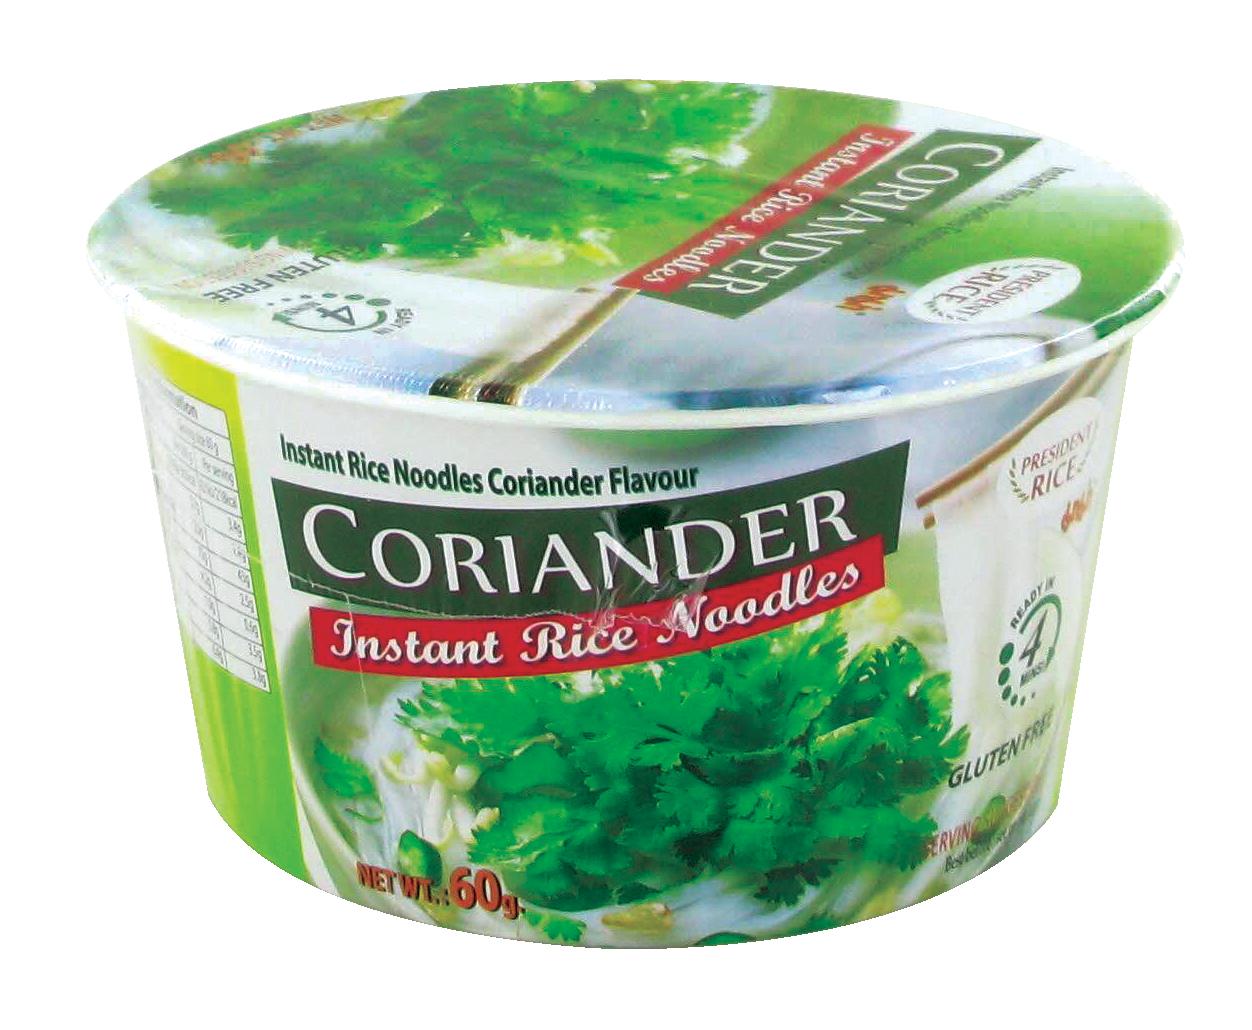 Nouilles de riz saveur coriandre, Mama (60 g)